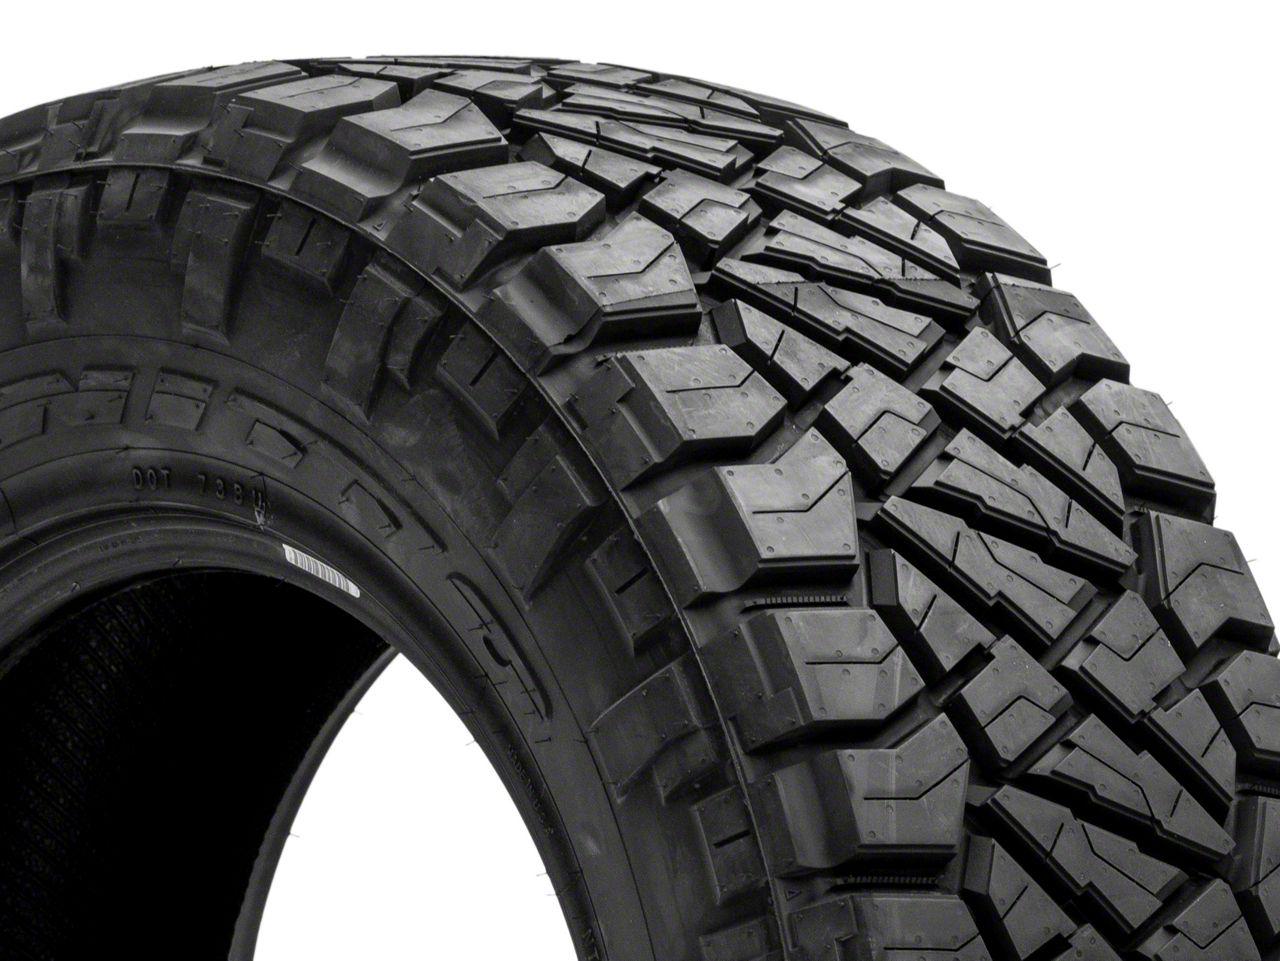 Nitto Ridge Grappler Sizes >> Nitto Ridge Grappler Tire Available In Multiple Sizes